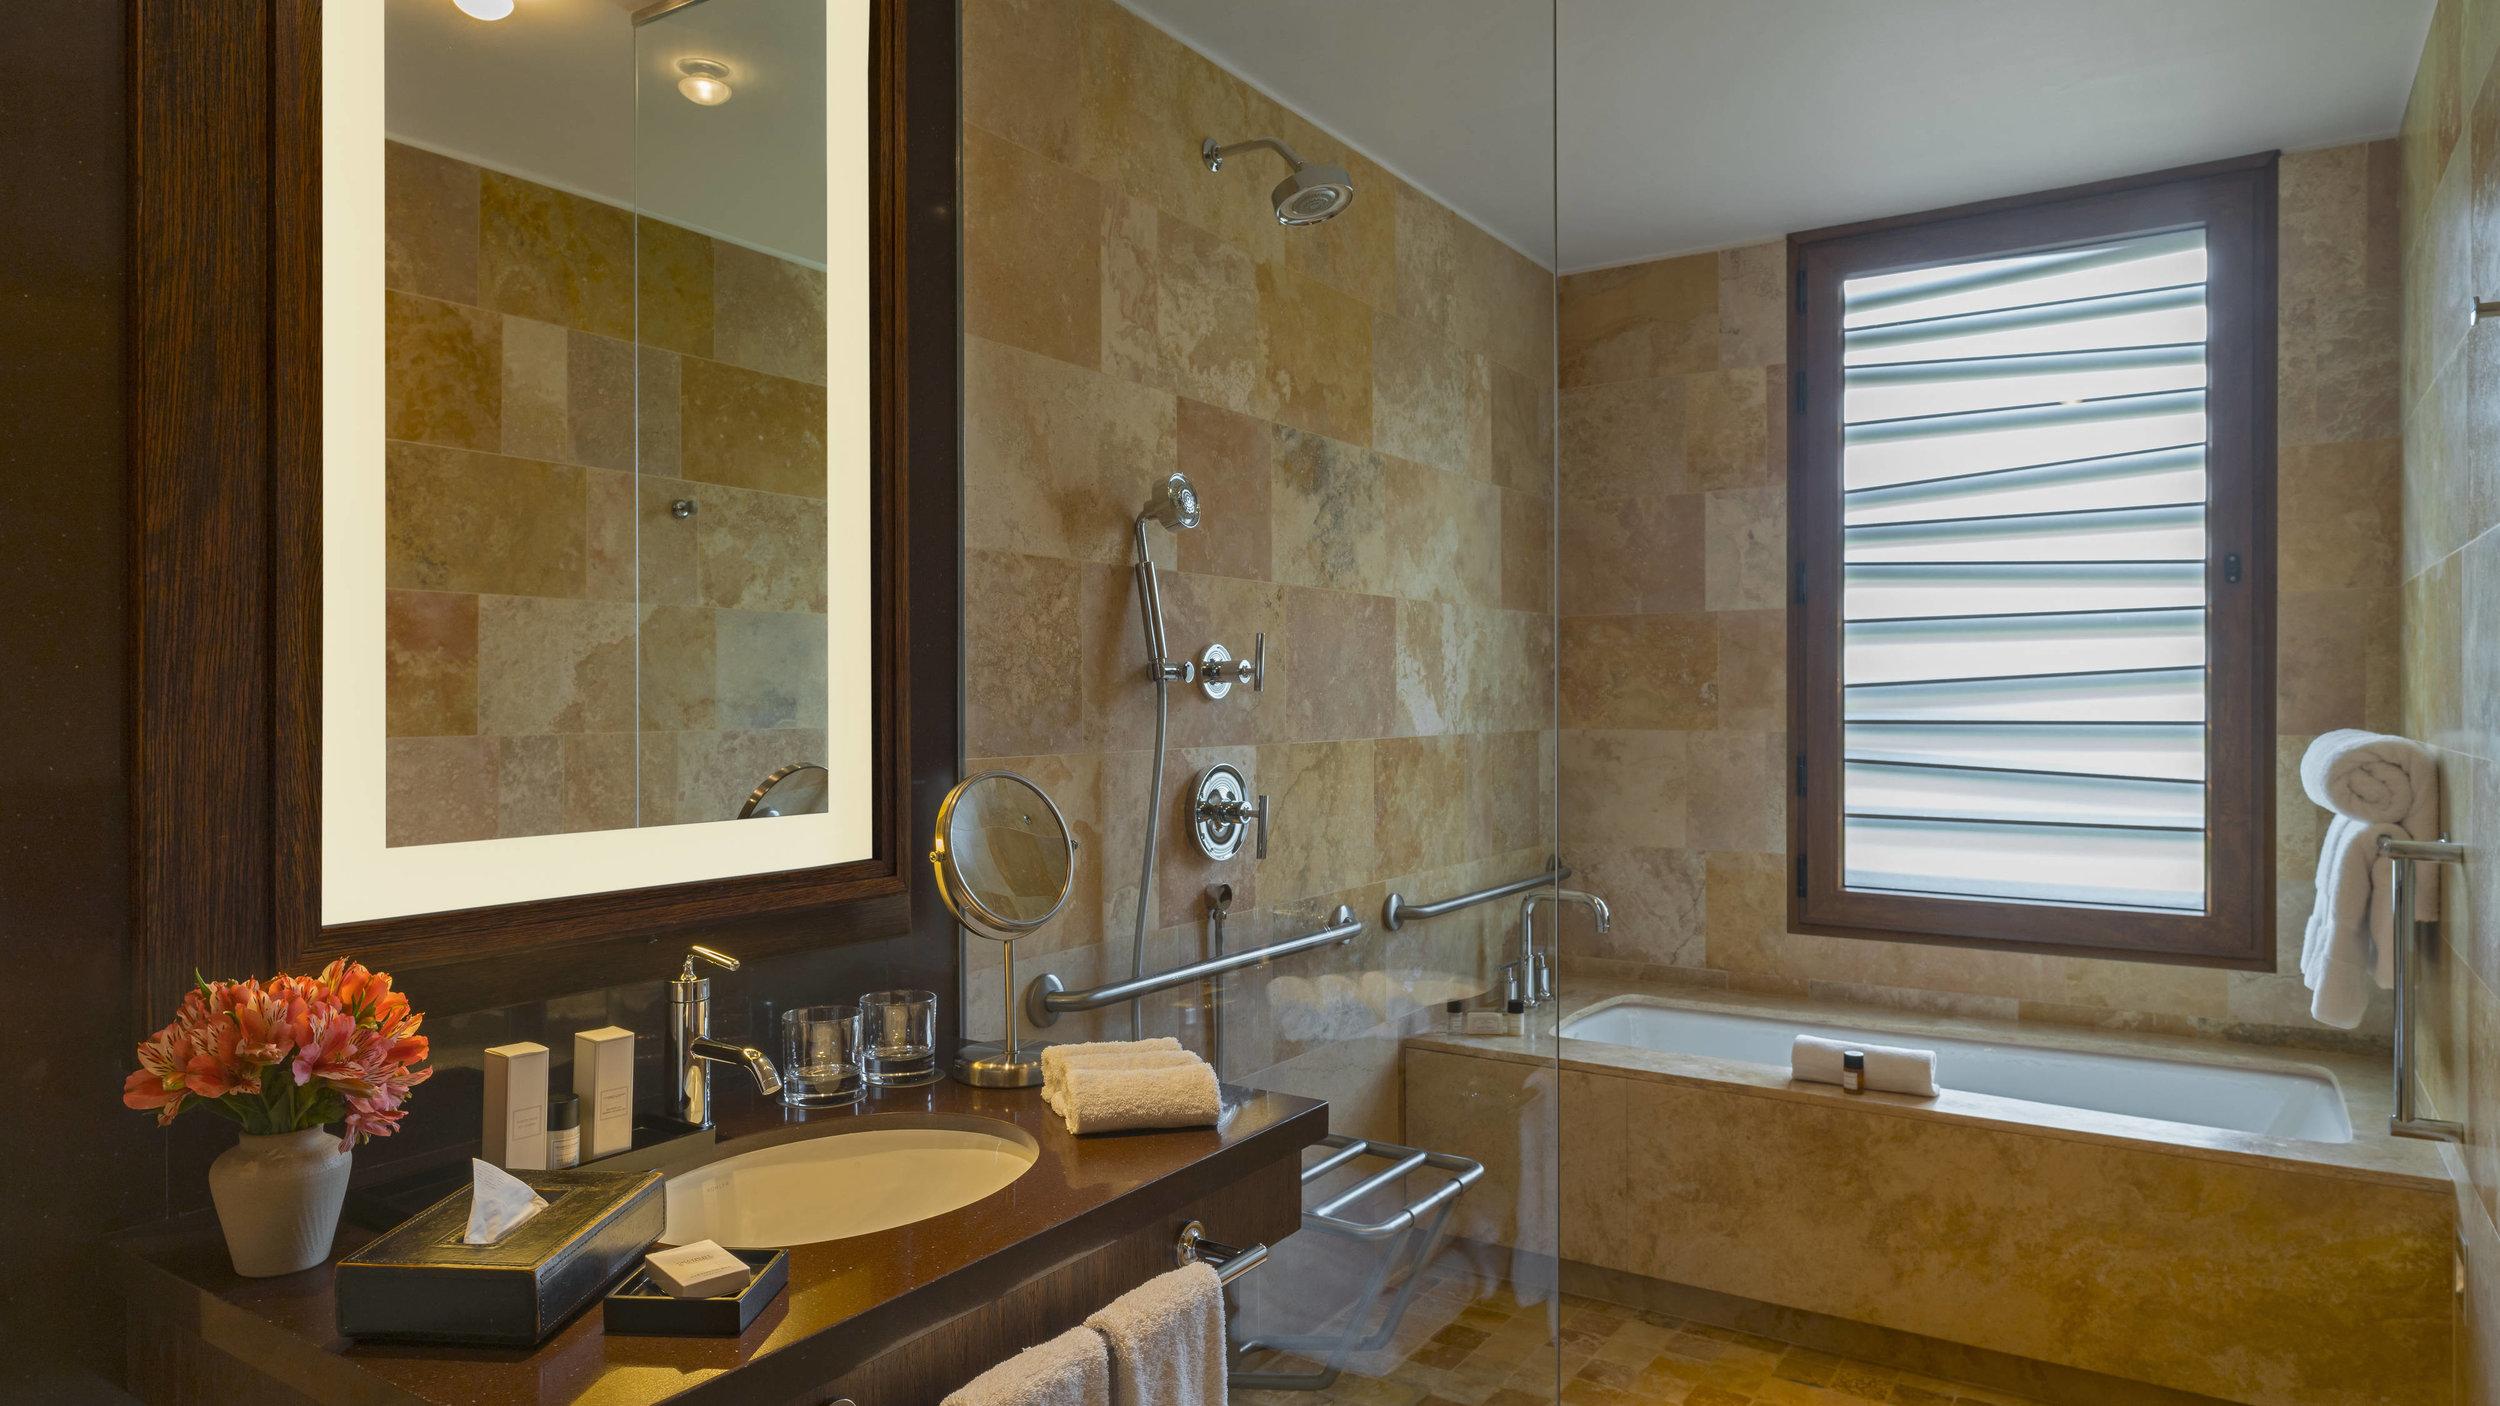 cuztl-bathroom-5212-hor-wide.jpg